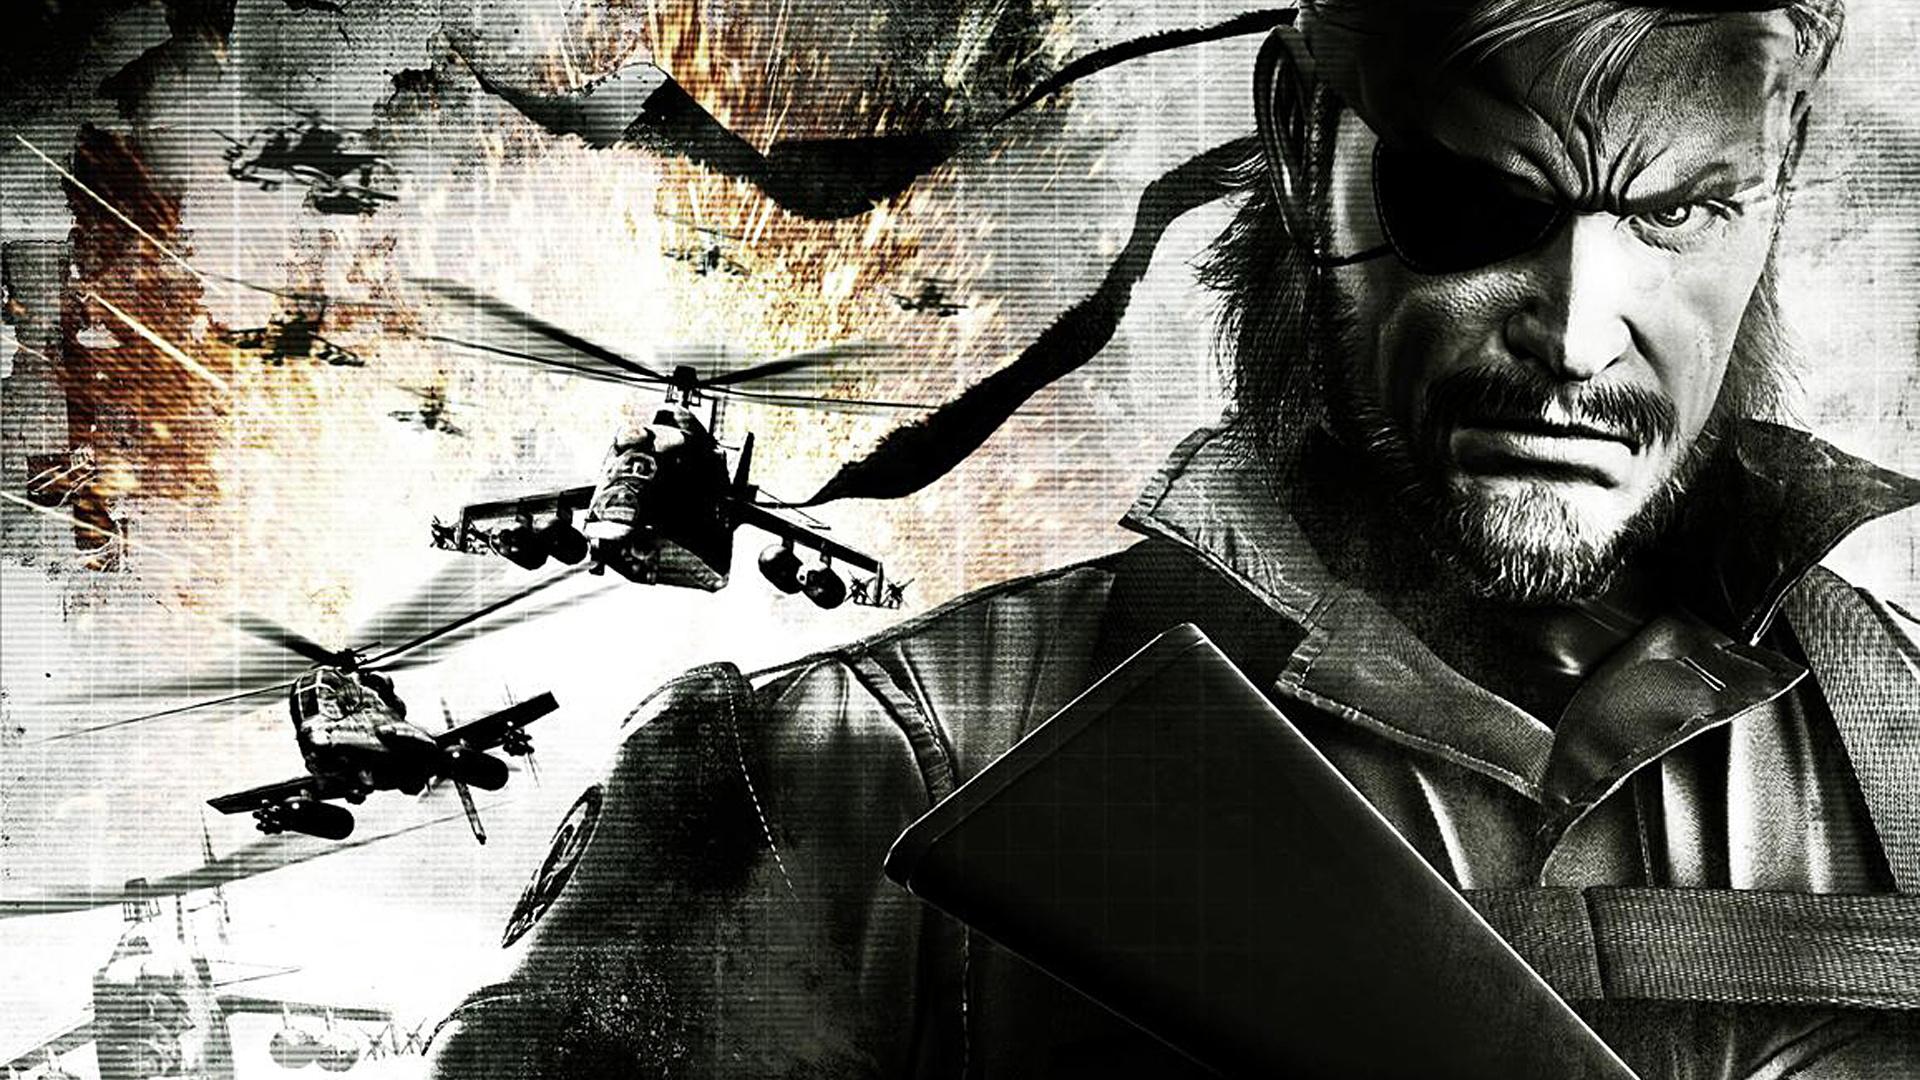 Экранизация Monster Hunter была вдохновлена Metal Gear Solid: Peace Walker